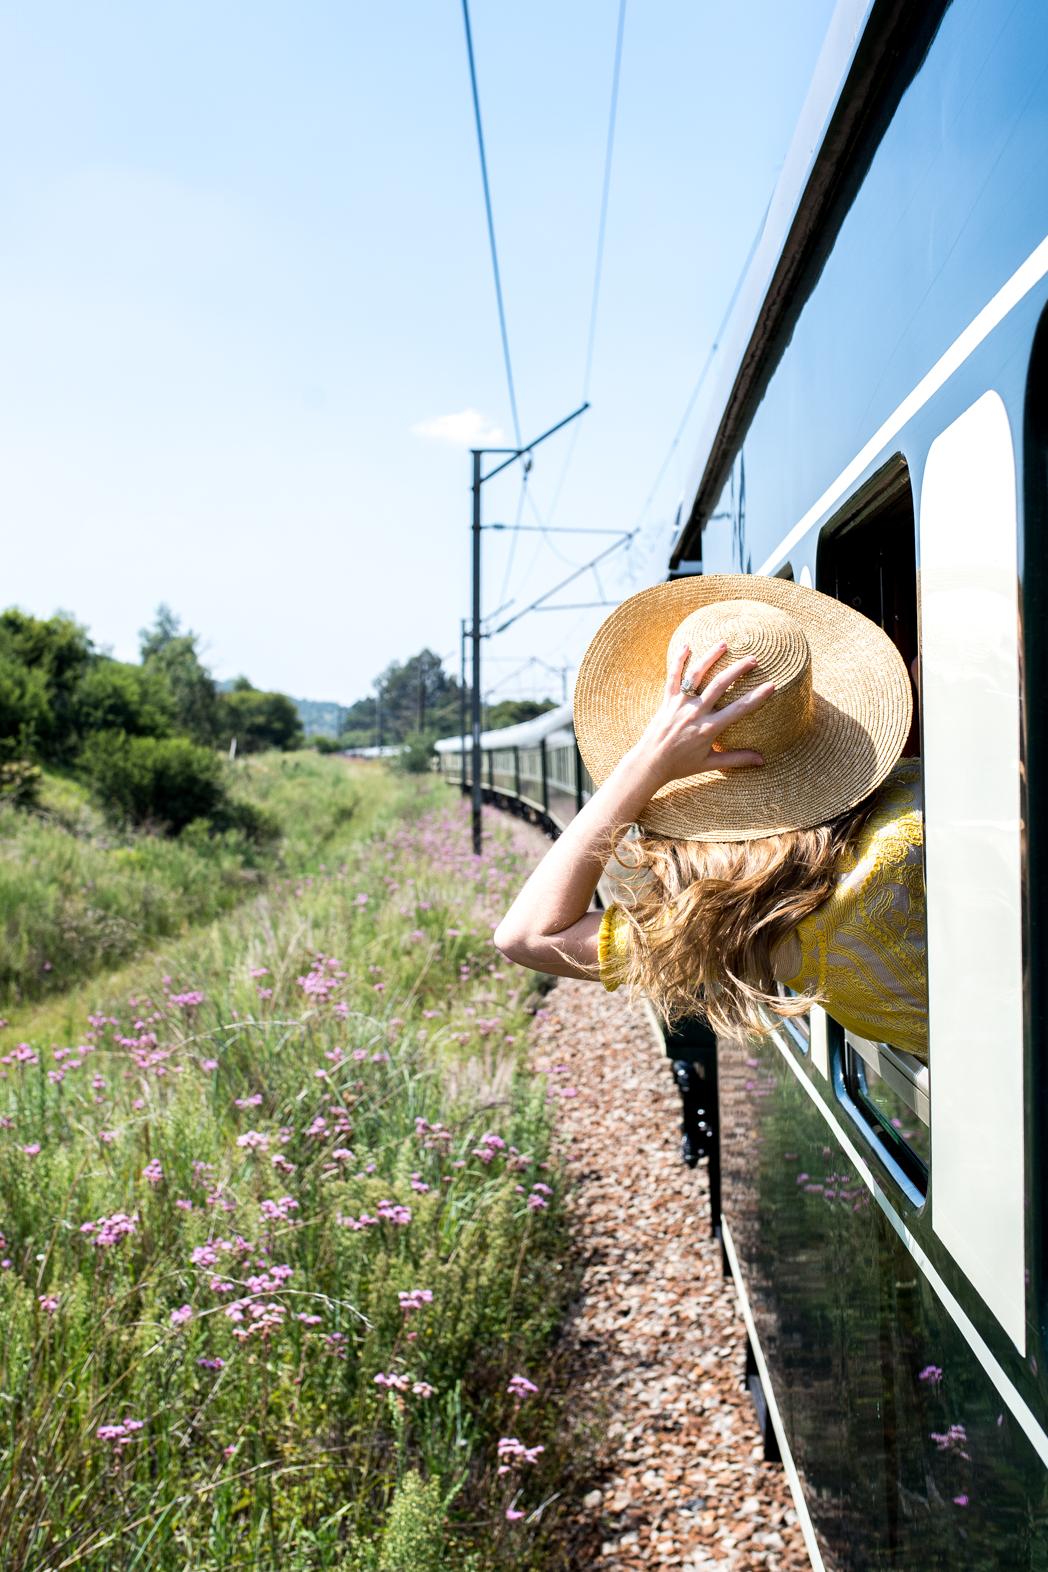 Stacie Flinner x Rovos Rail Durban Safari-83